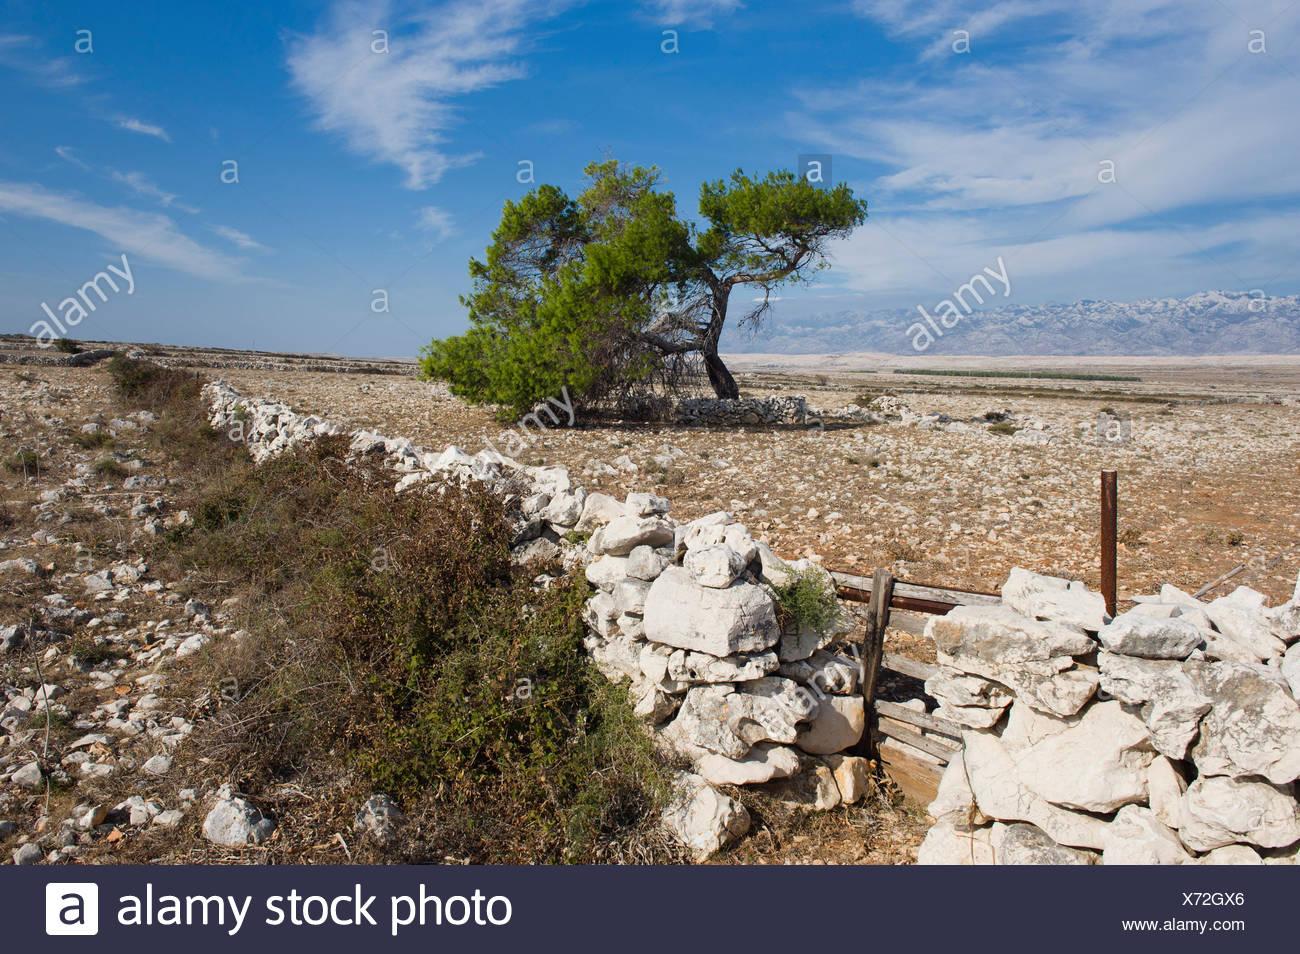 natural stone wall plants photos & natural stone wall plants images